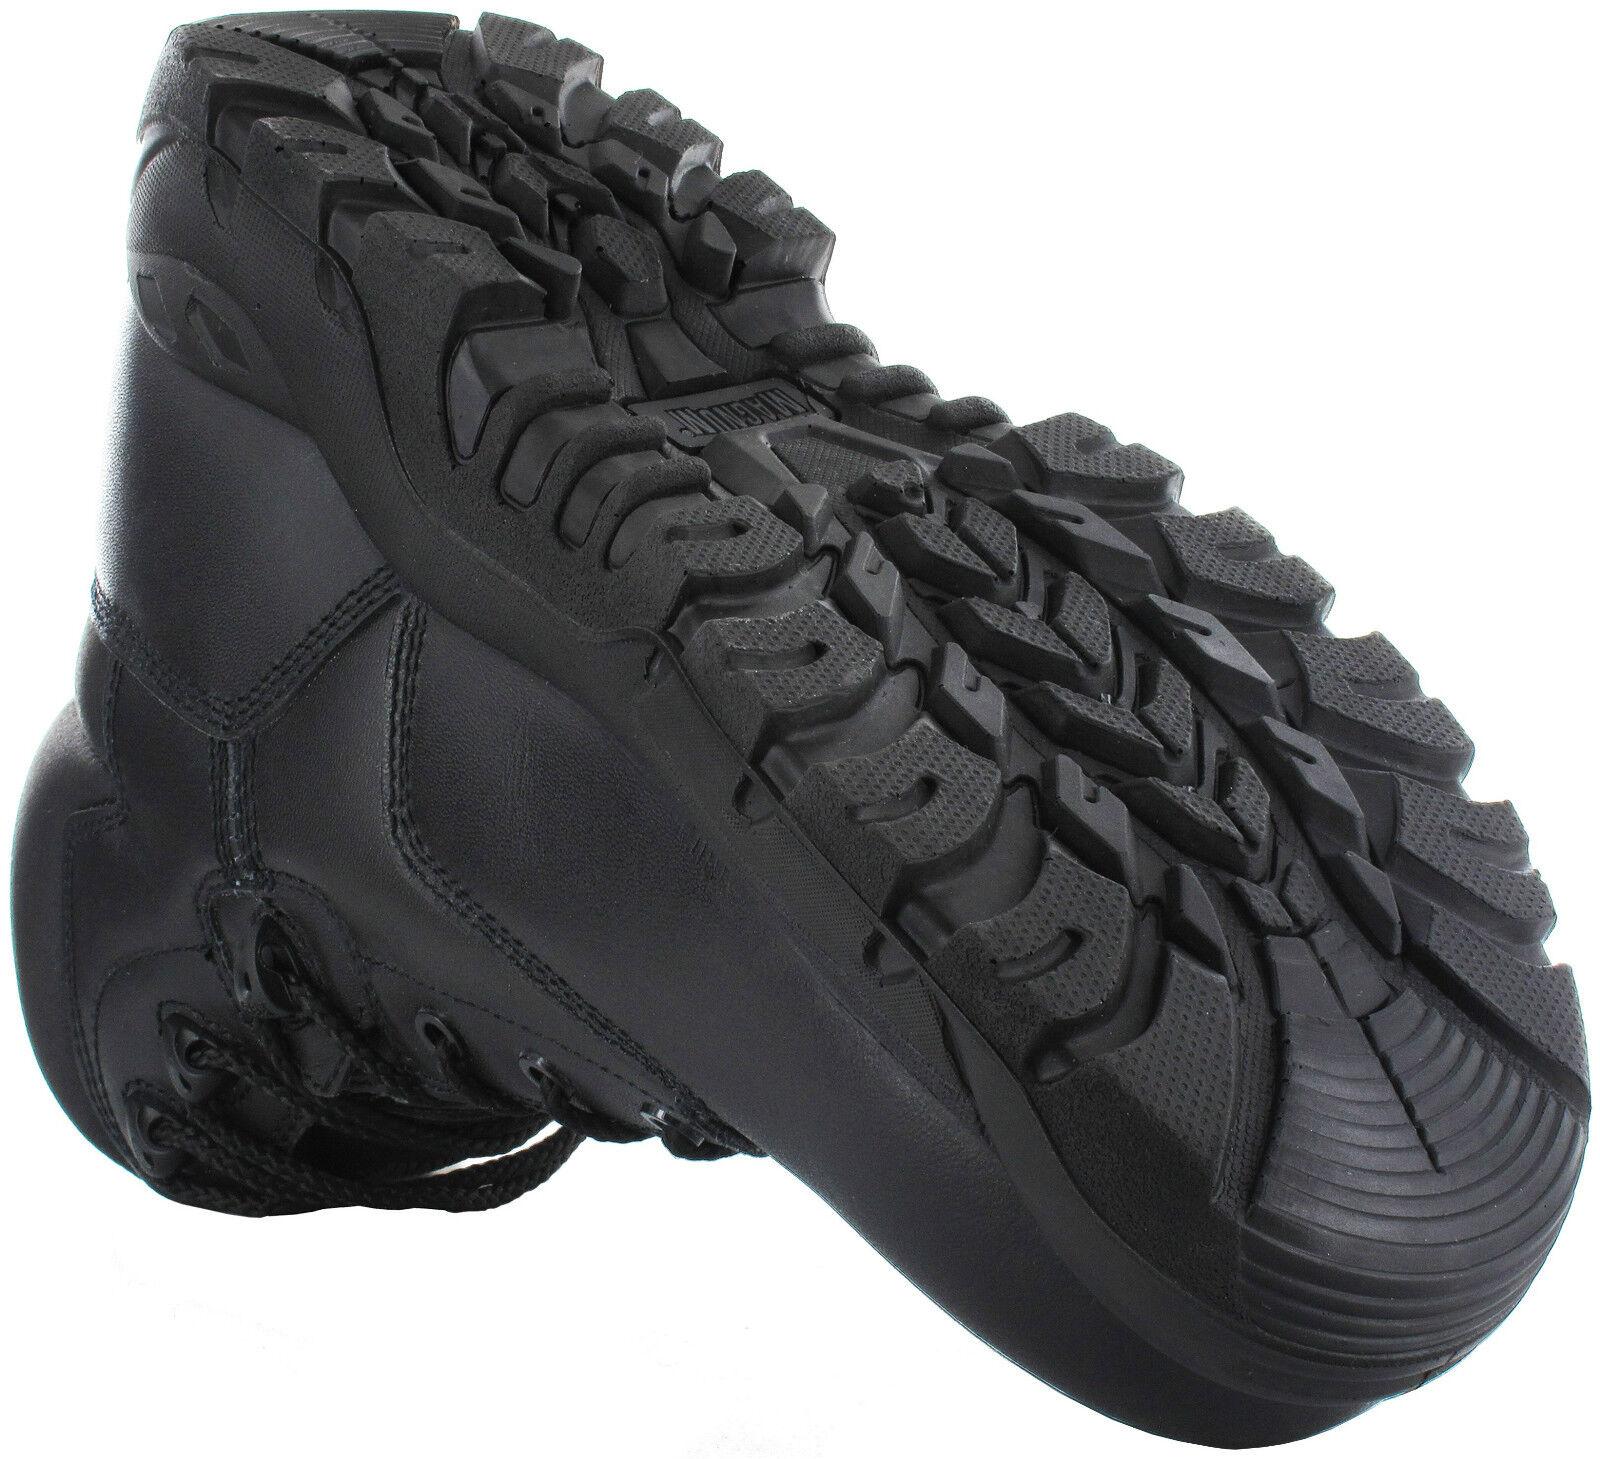 Herren Magnum Powercad Wasserfest Sicherheit Wanderer Arbeitsstiefel Schuhe Wanderer Sicherheit e10d2a